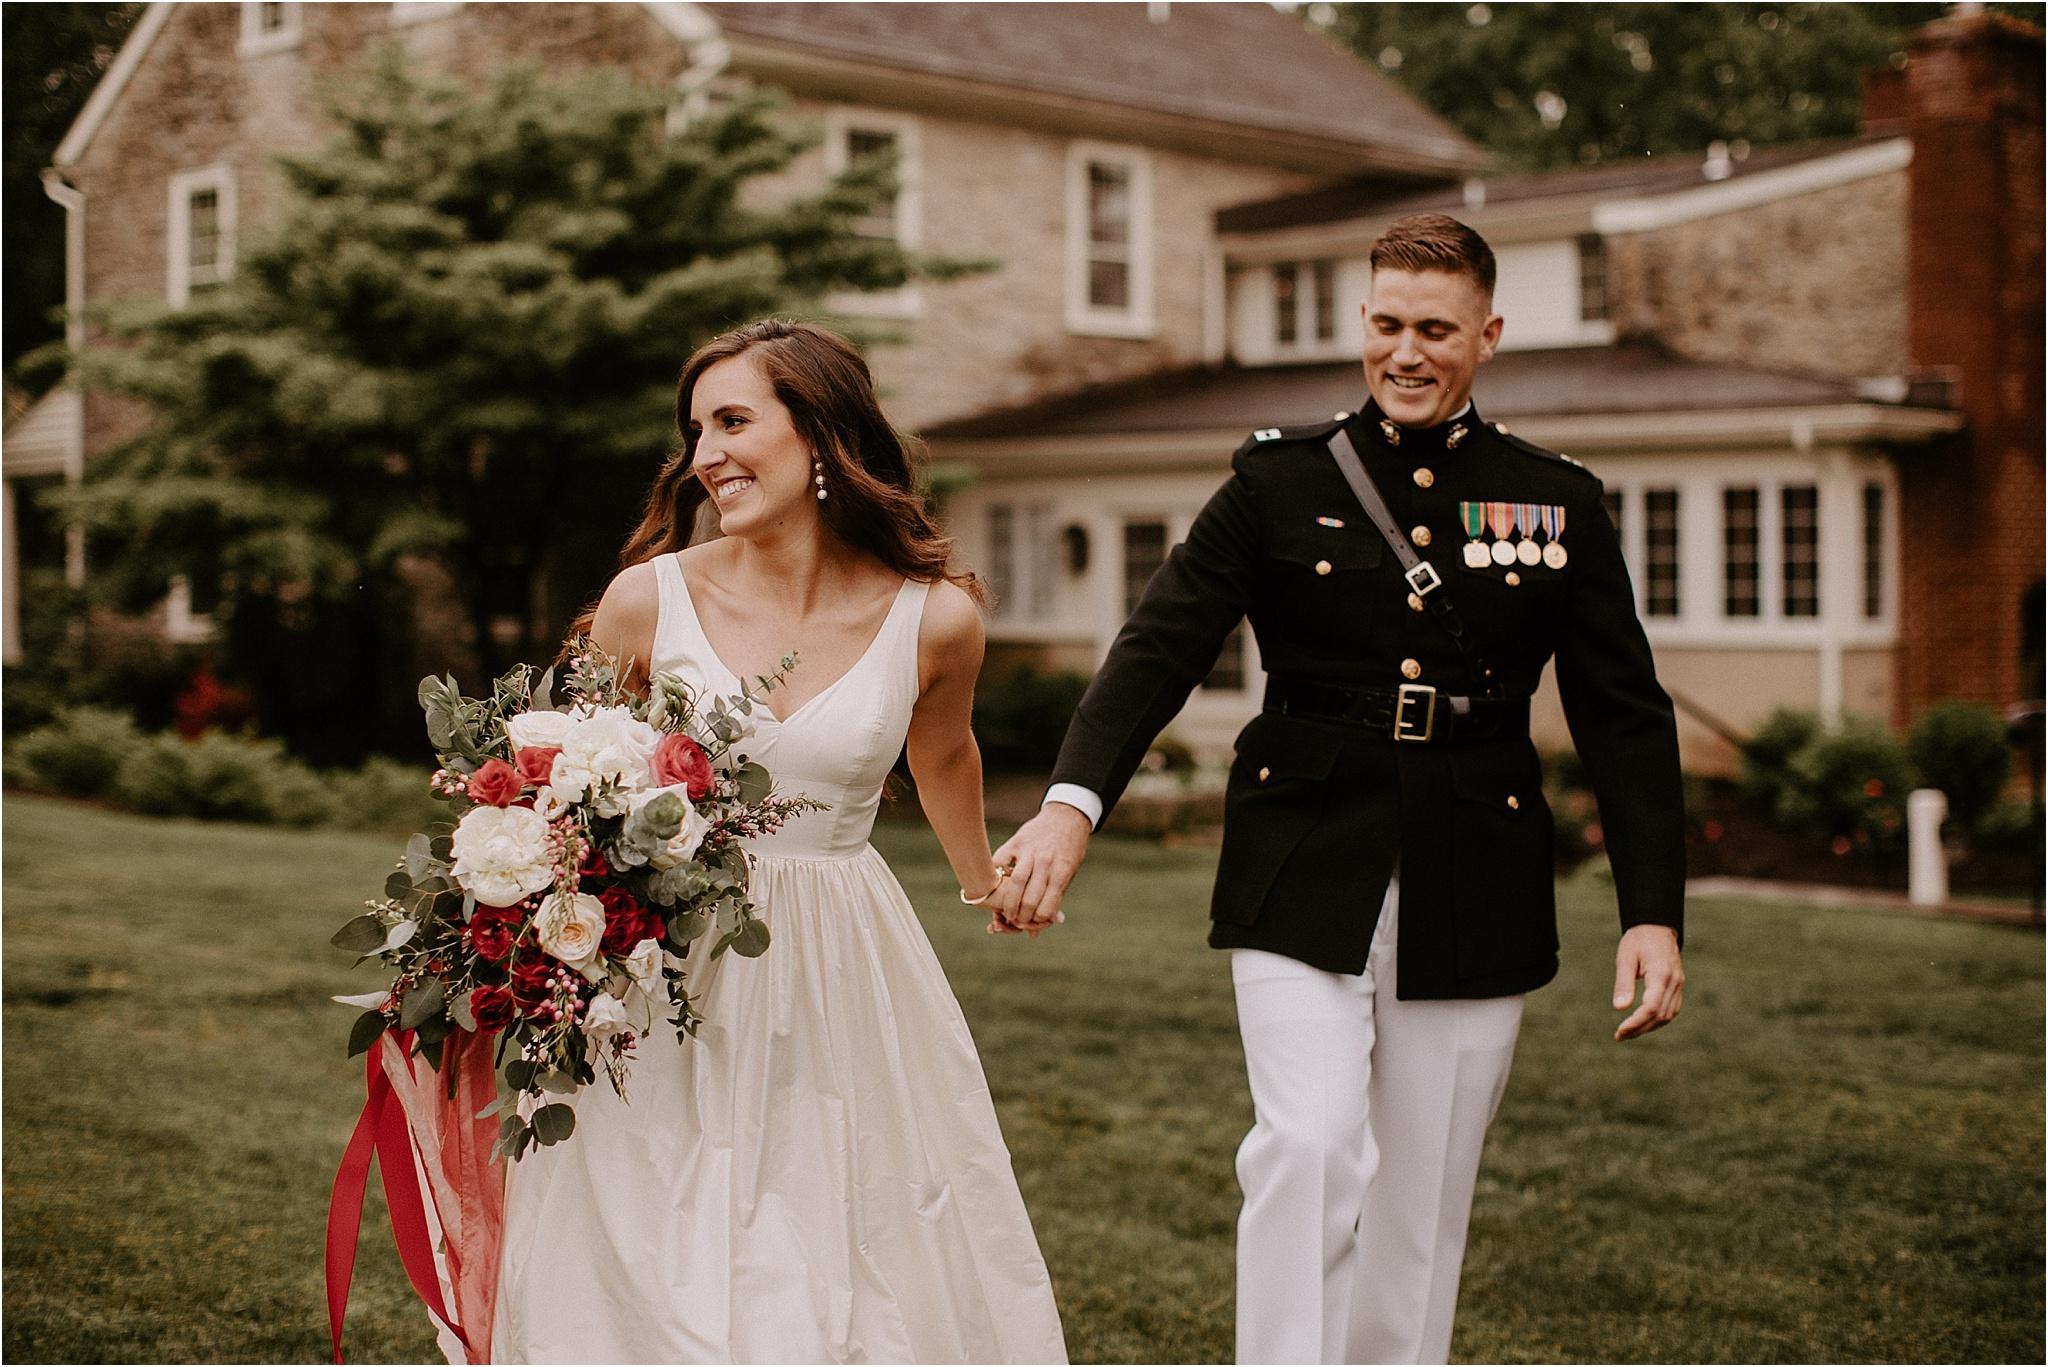 Sarah_Brookhart_Farm_at_Eagles_Ridge_Wedding_Photographer_0031.jpg